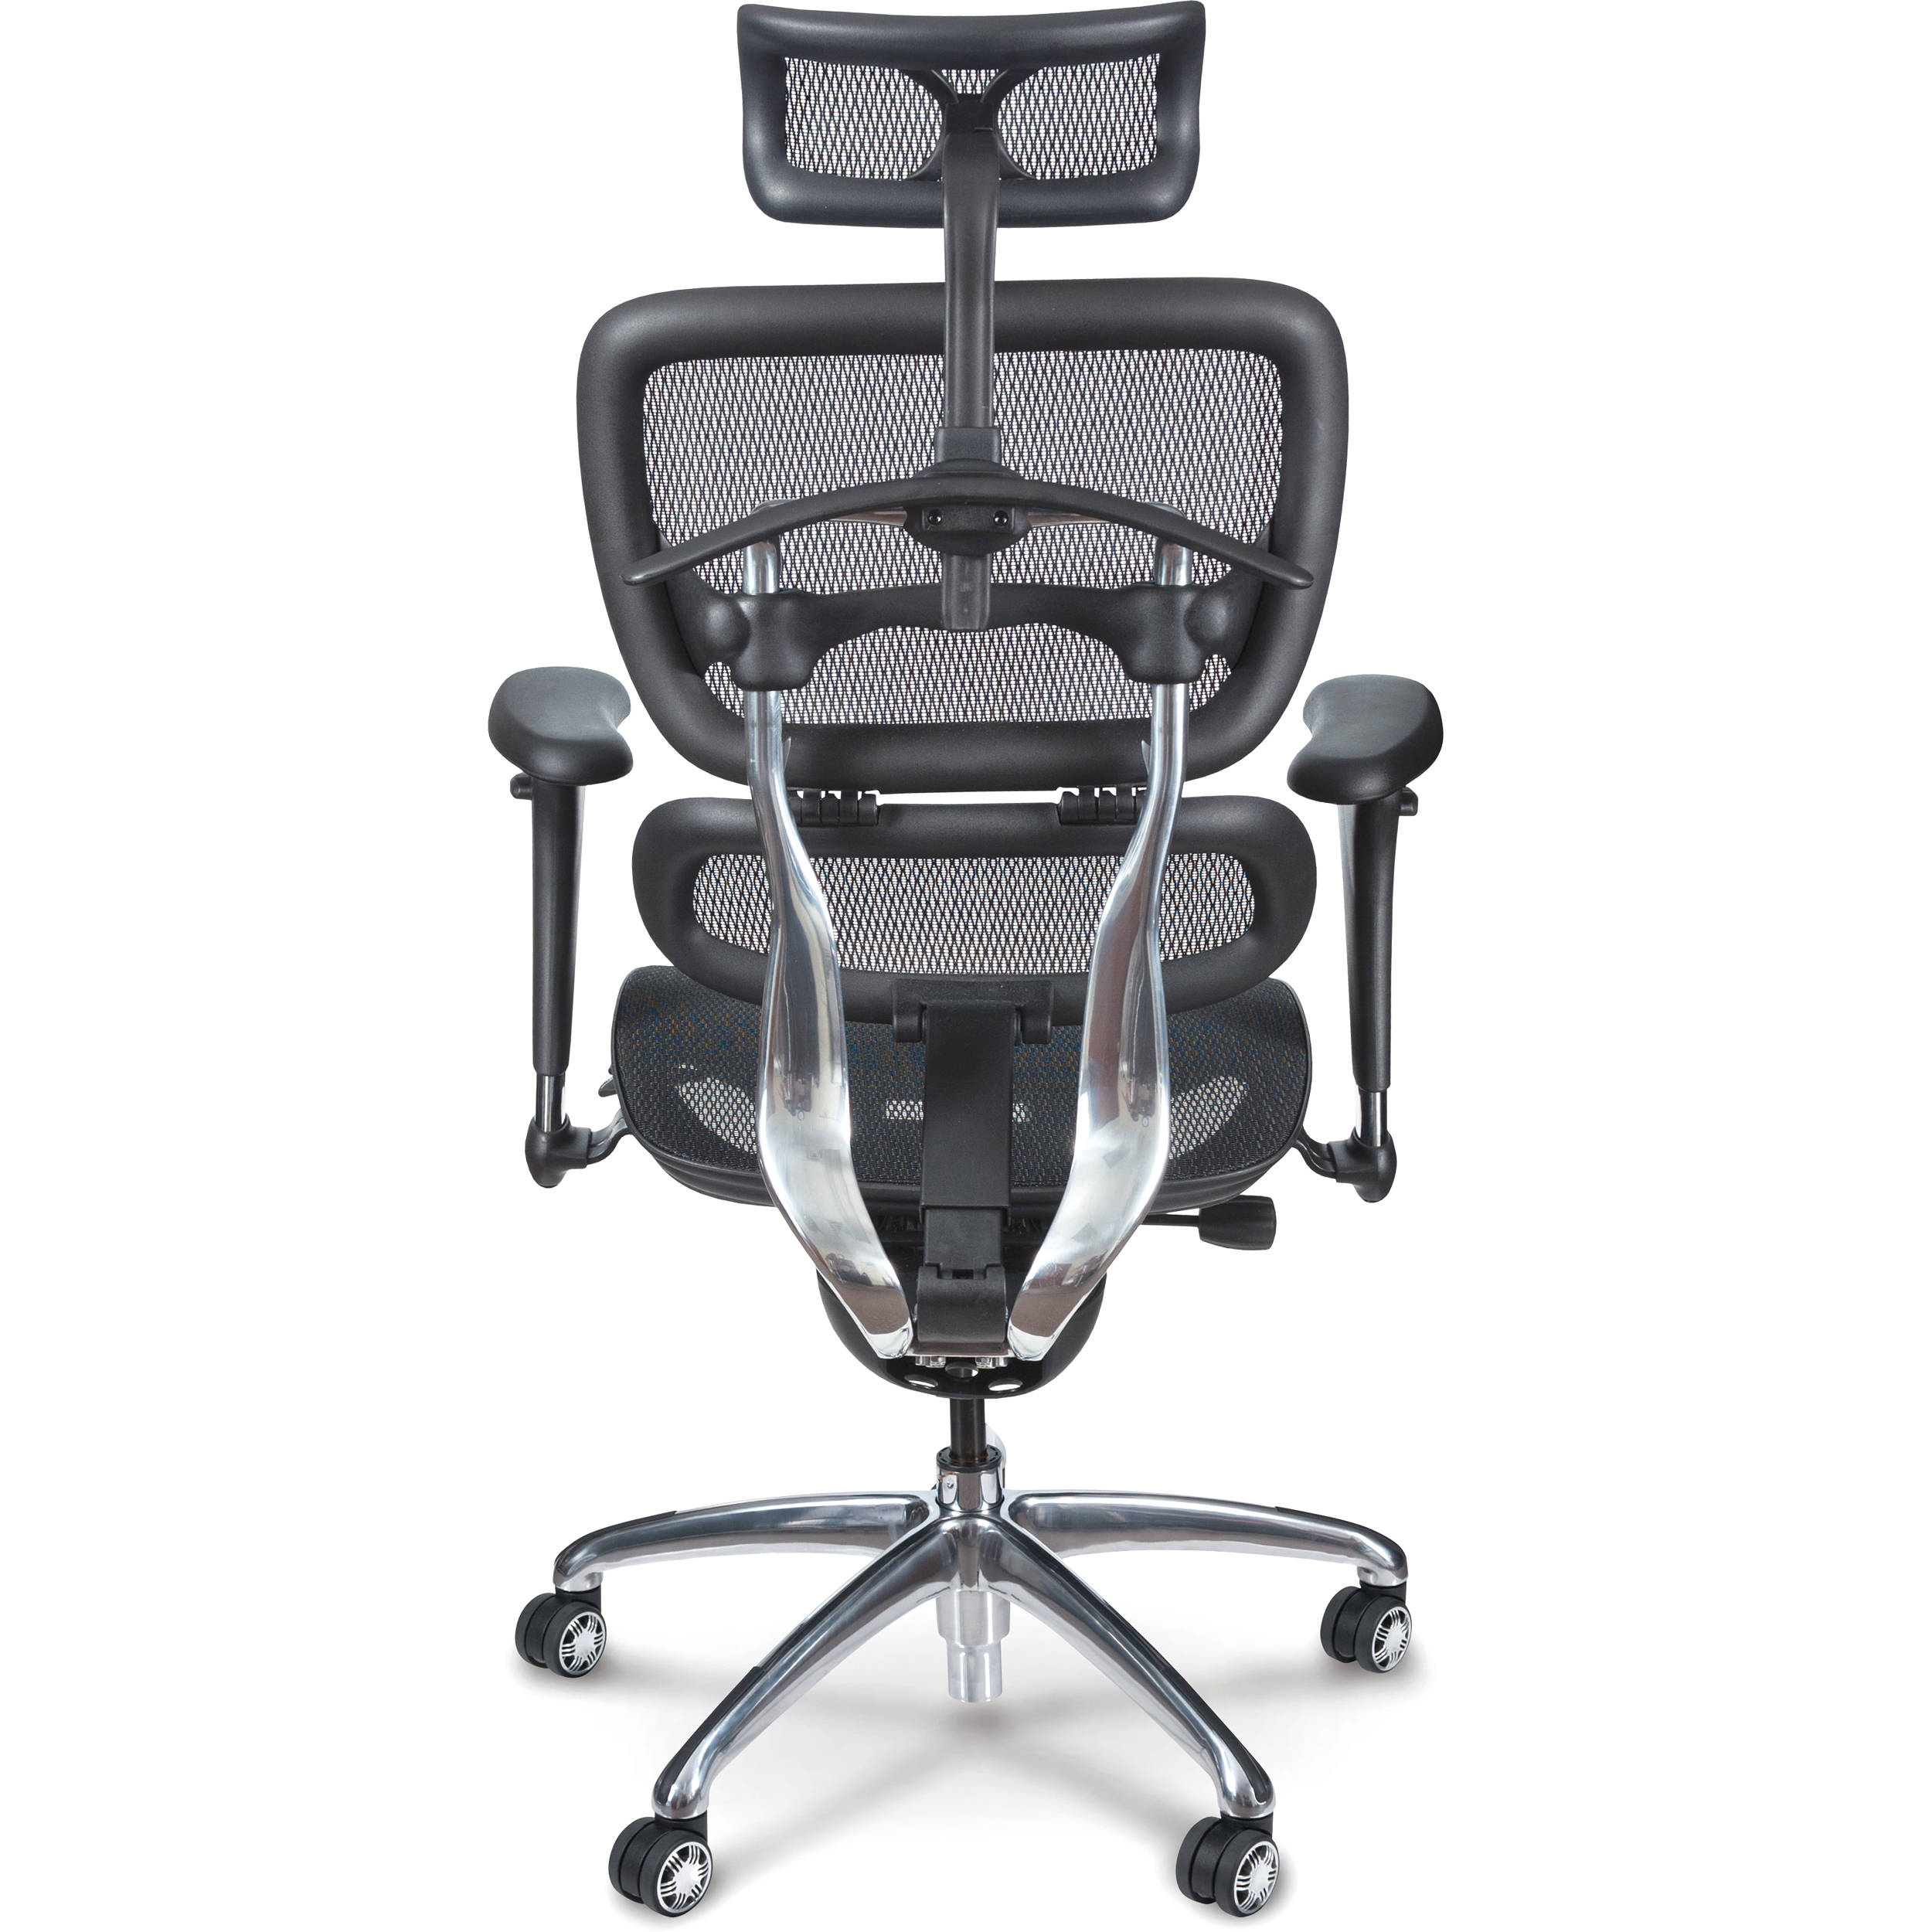 Balt Butterfly Ergonomic Fully Adjustable Office Chair 34729 B H